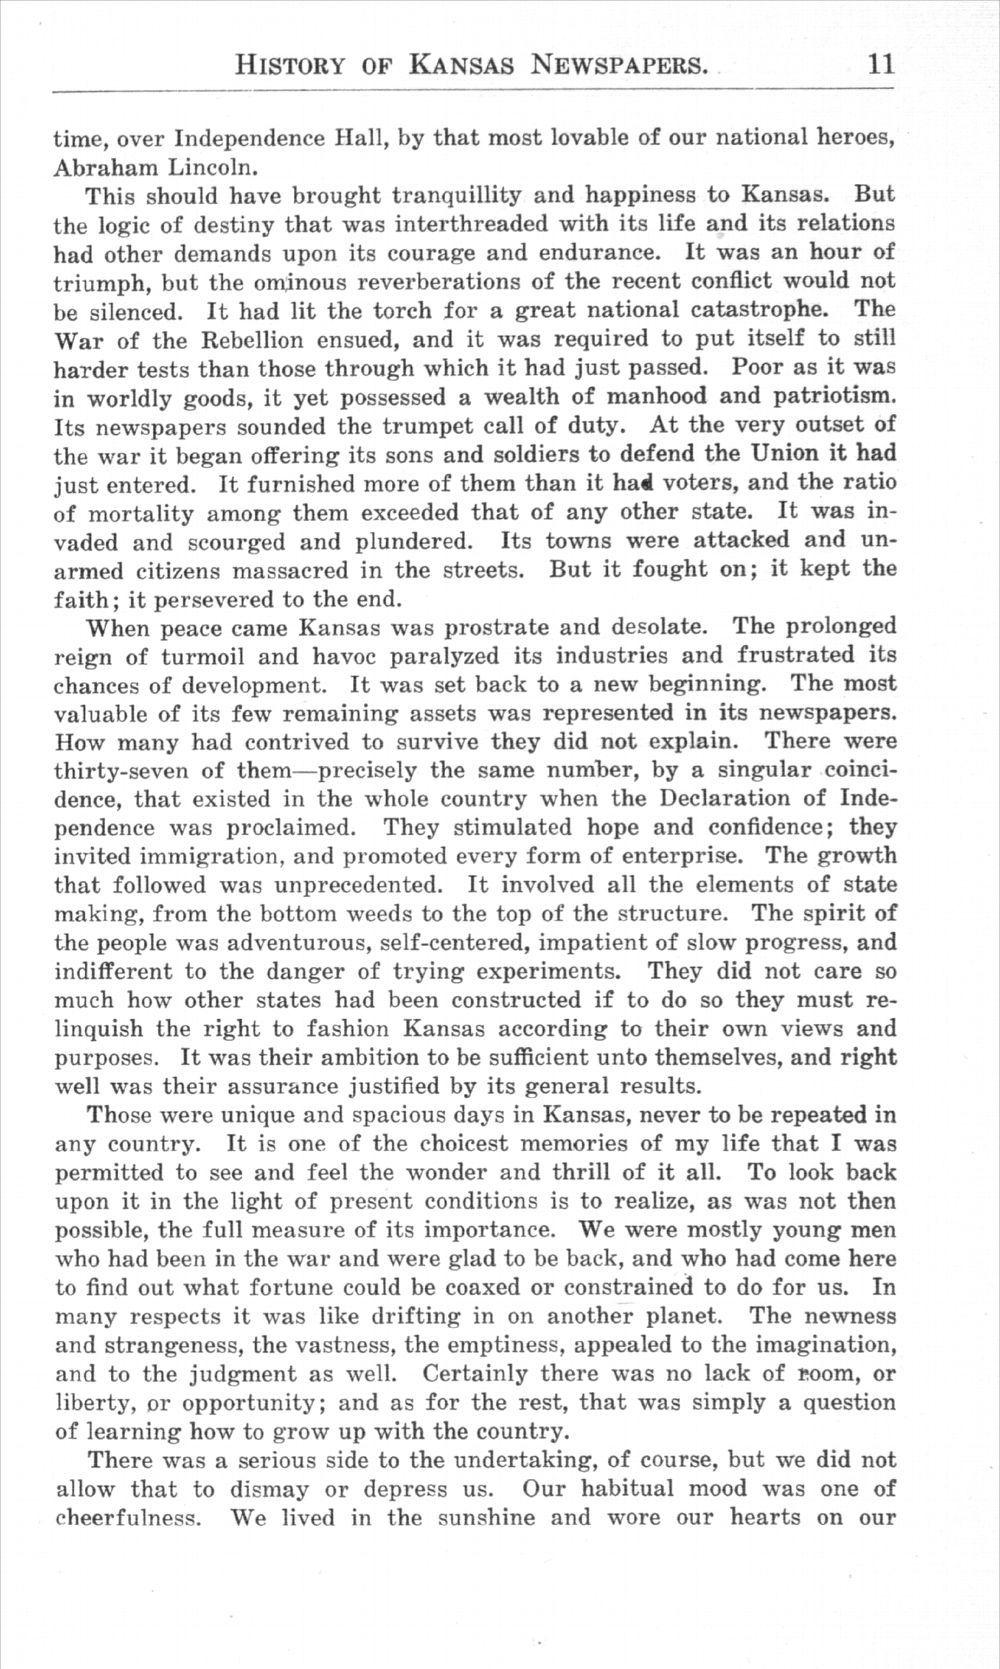 History of Kansas newspapers - 11